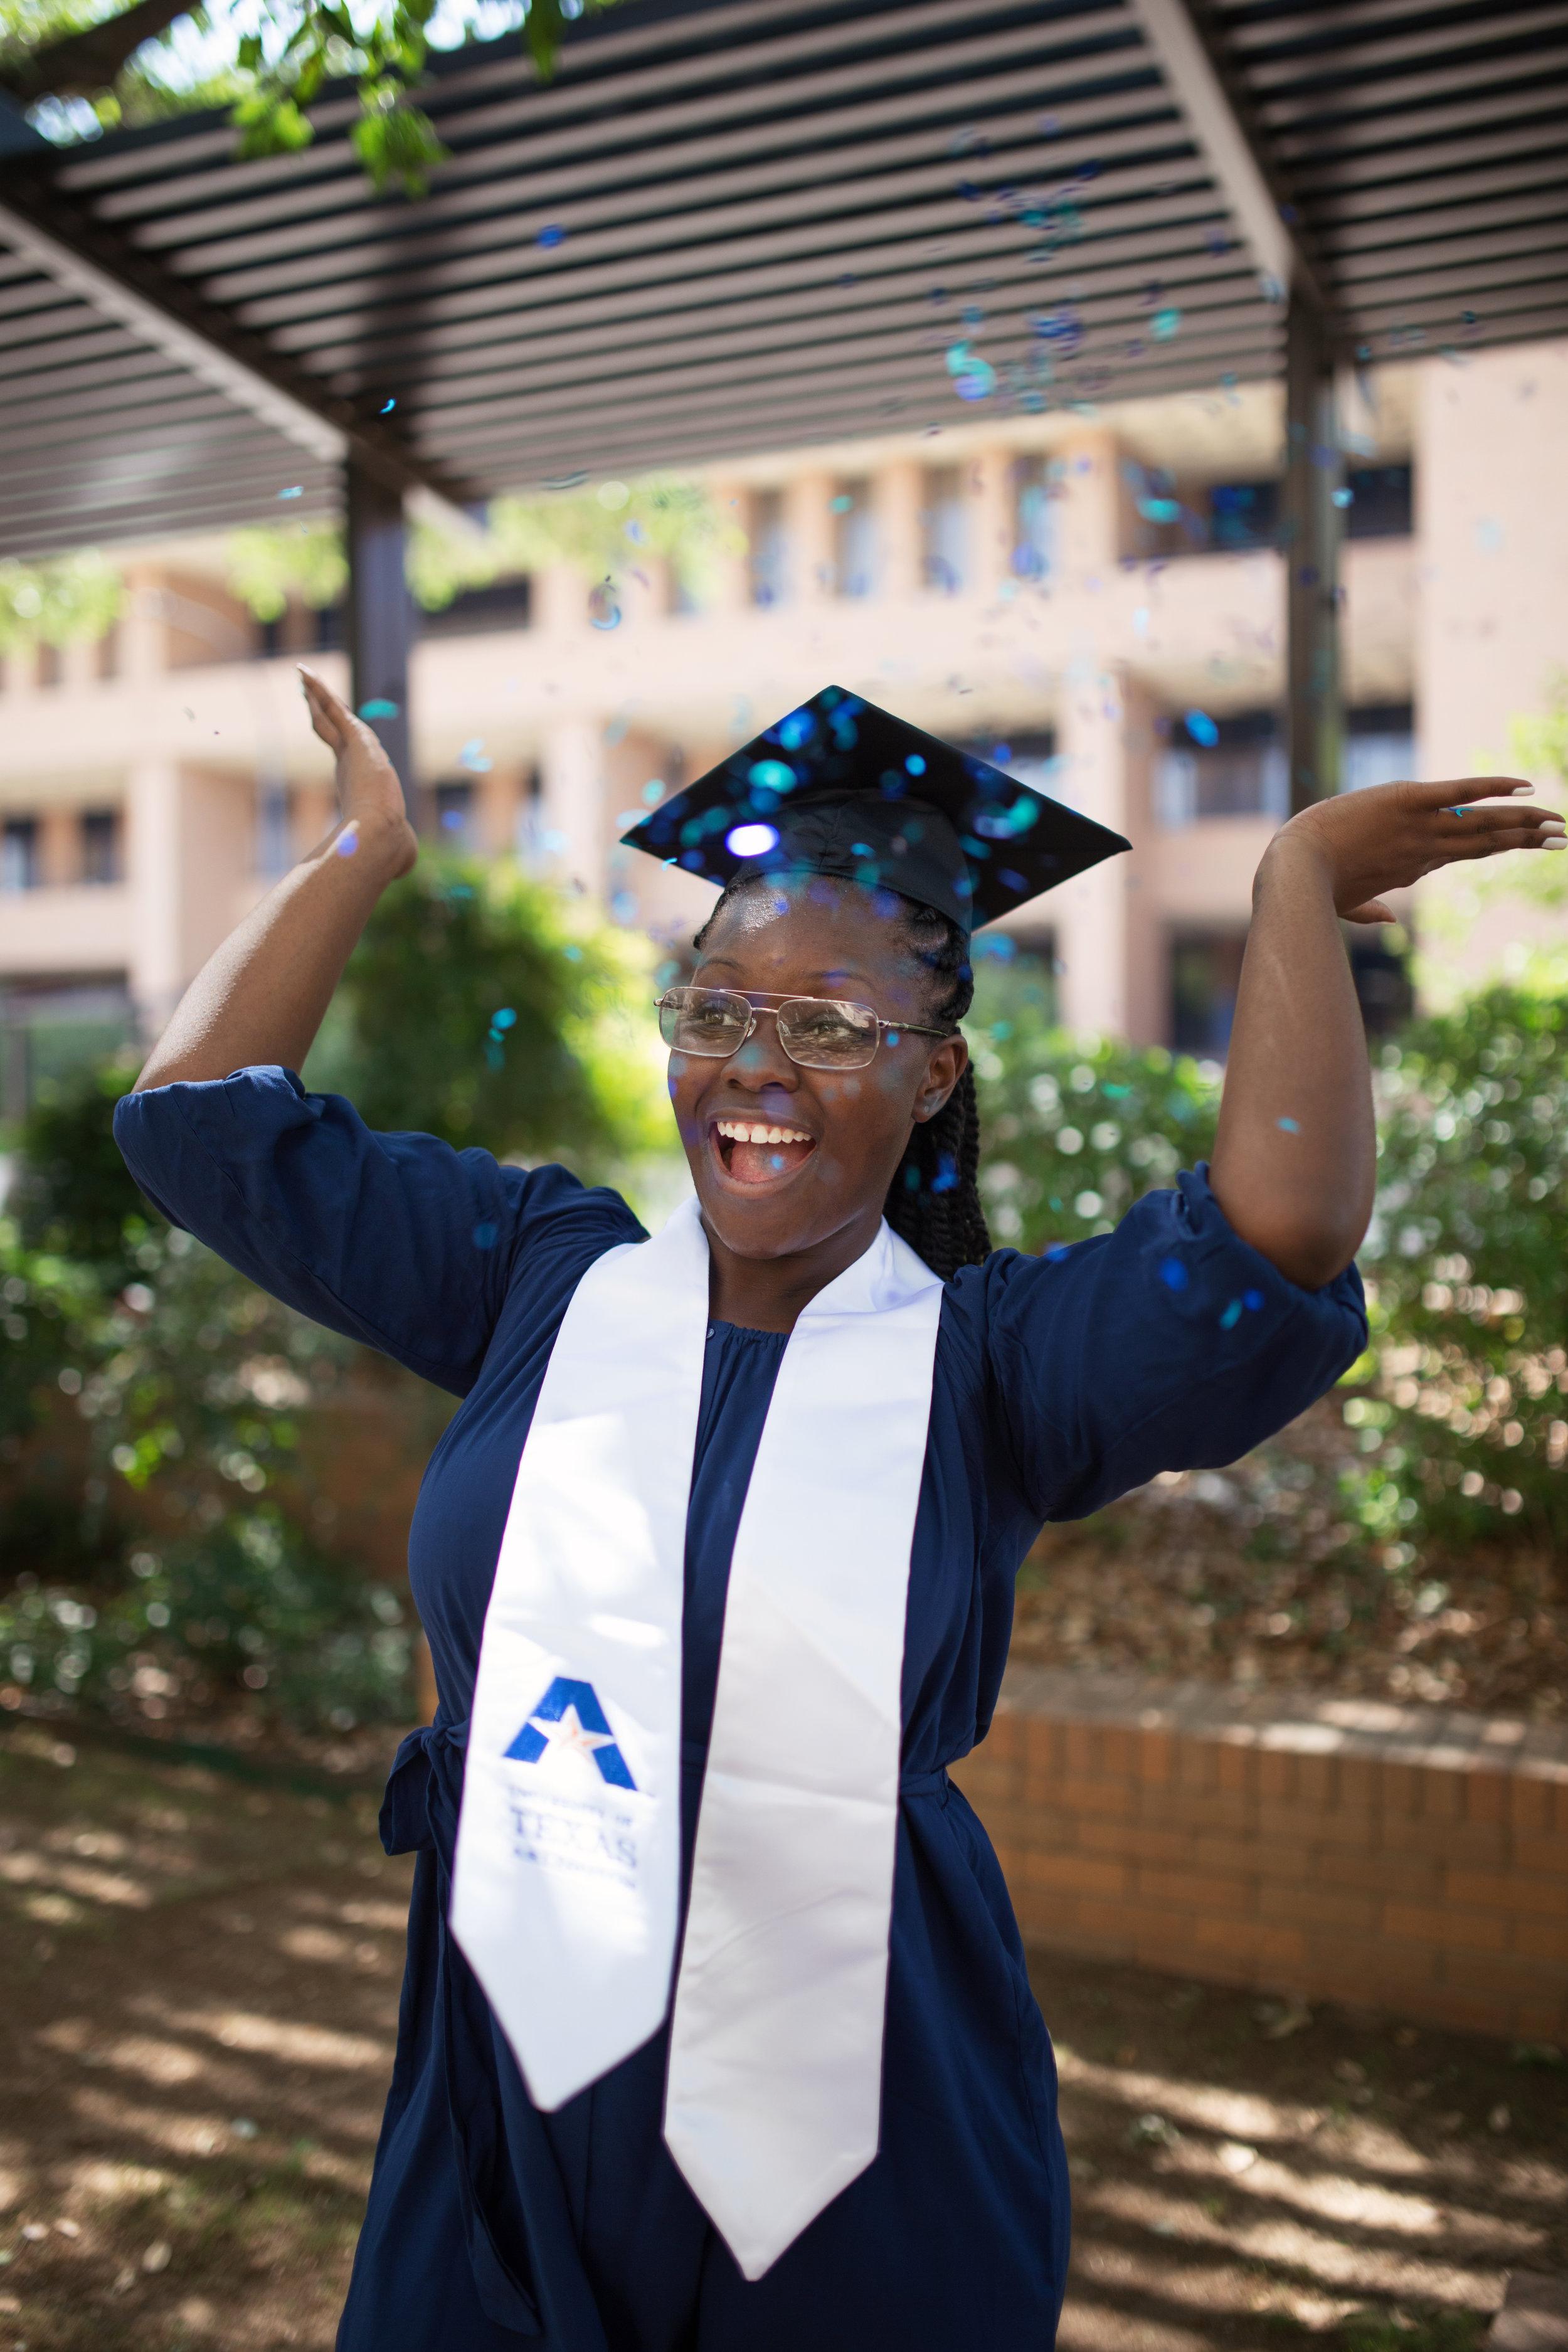 Tiara_UTA_Graduation-57.jpg